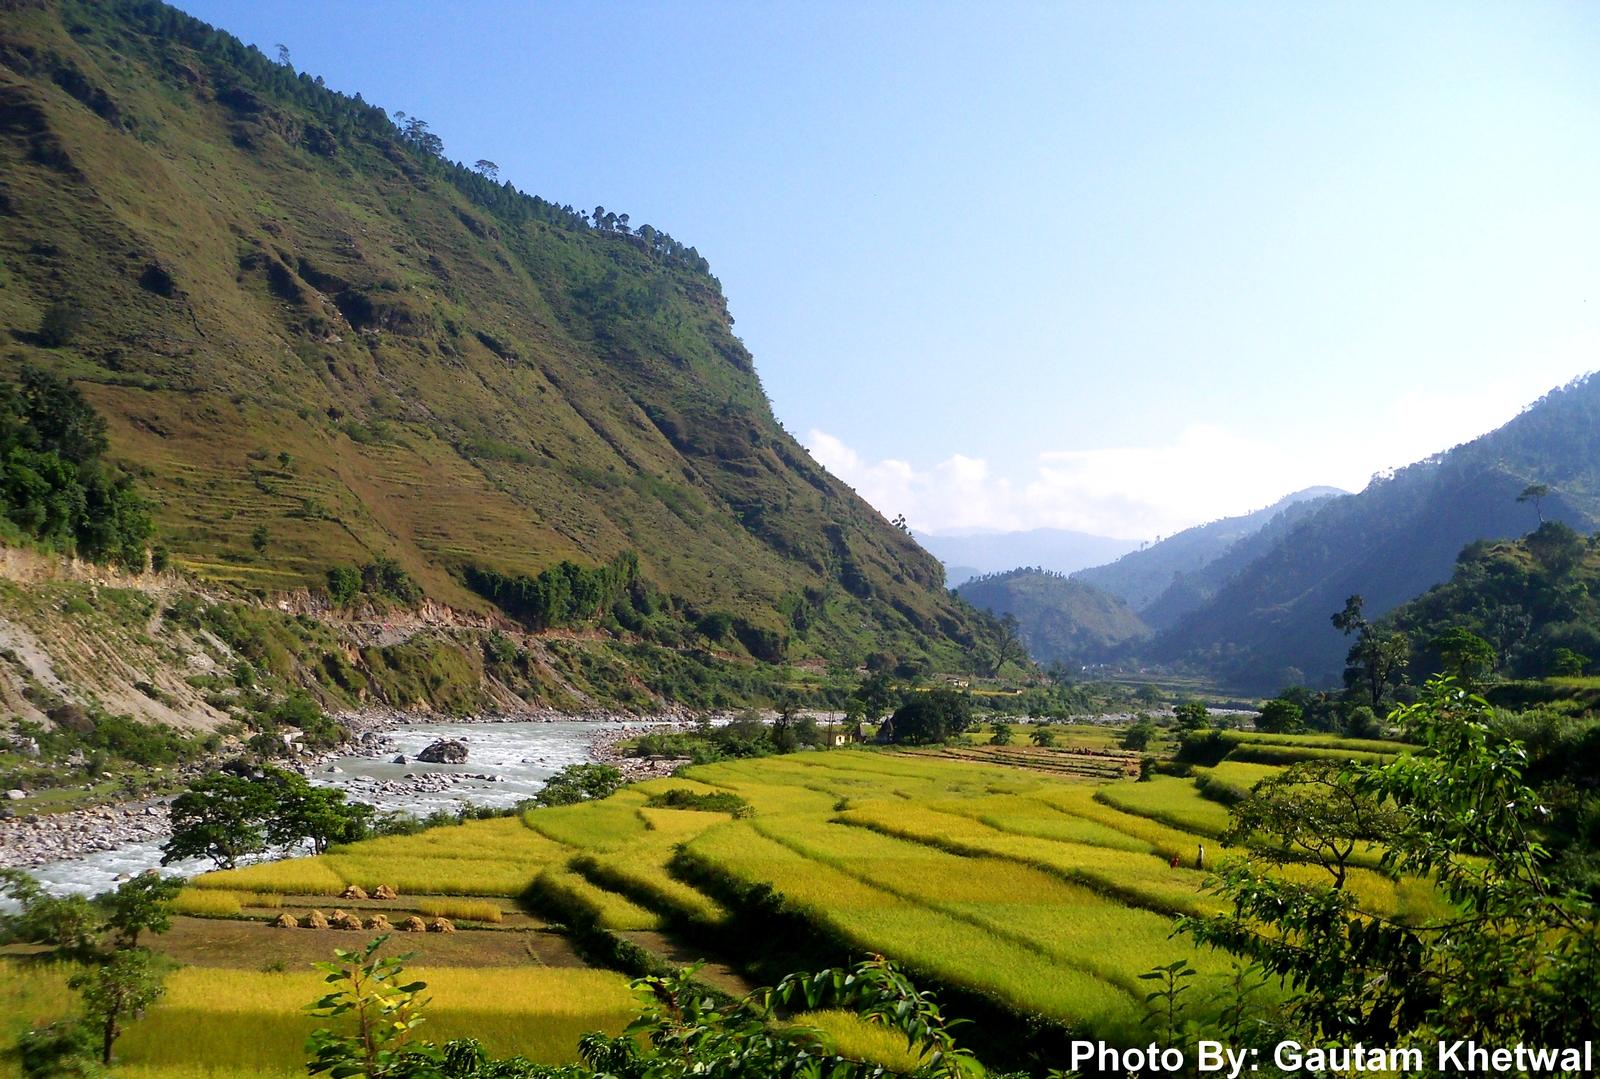 uttra khand Uttarakhand photo gallery - a virtual tour to uttarakhand uttarakhand photo gallery offers over 1500 pictures of uttarakhand - uttarakhand tourism, c.